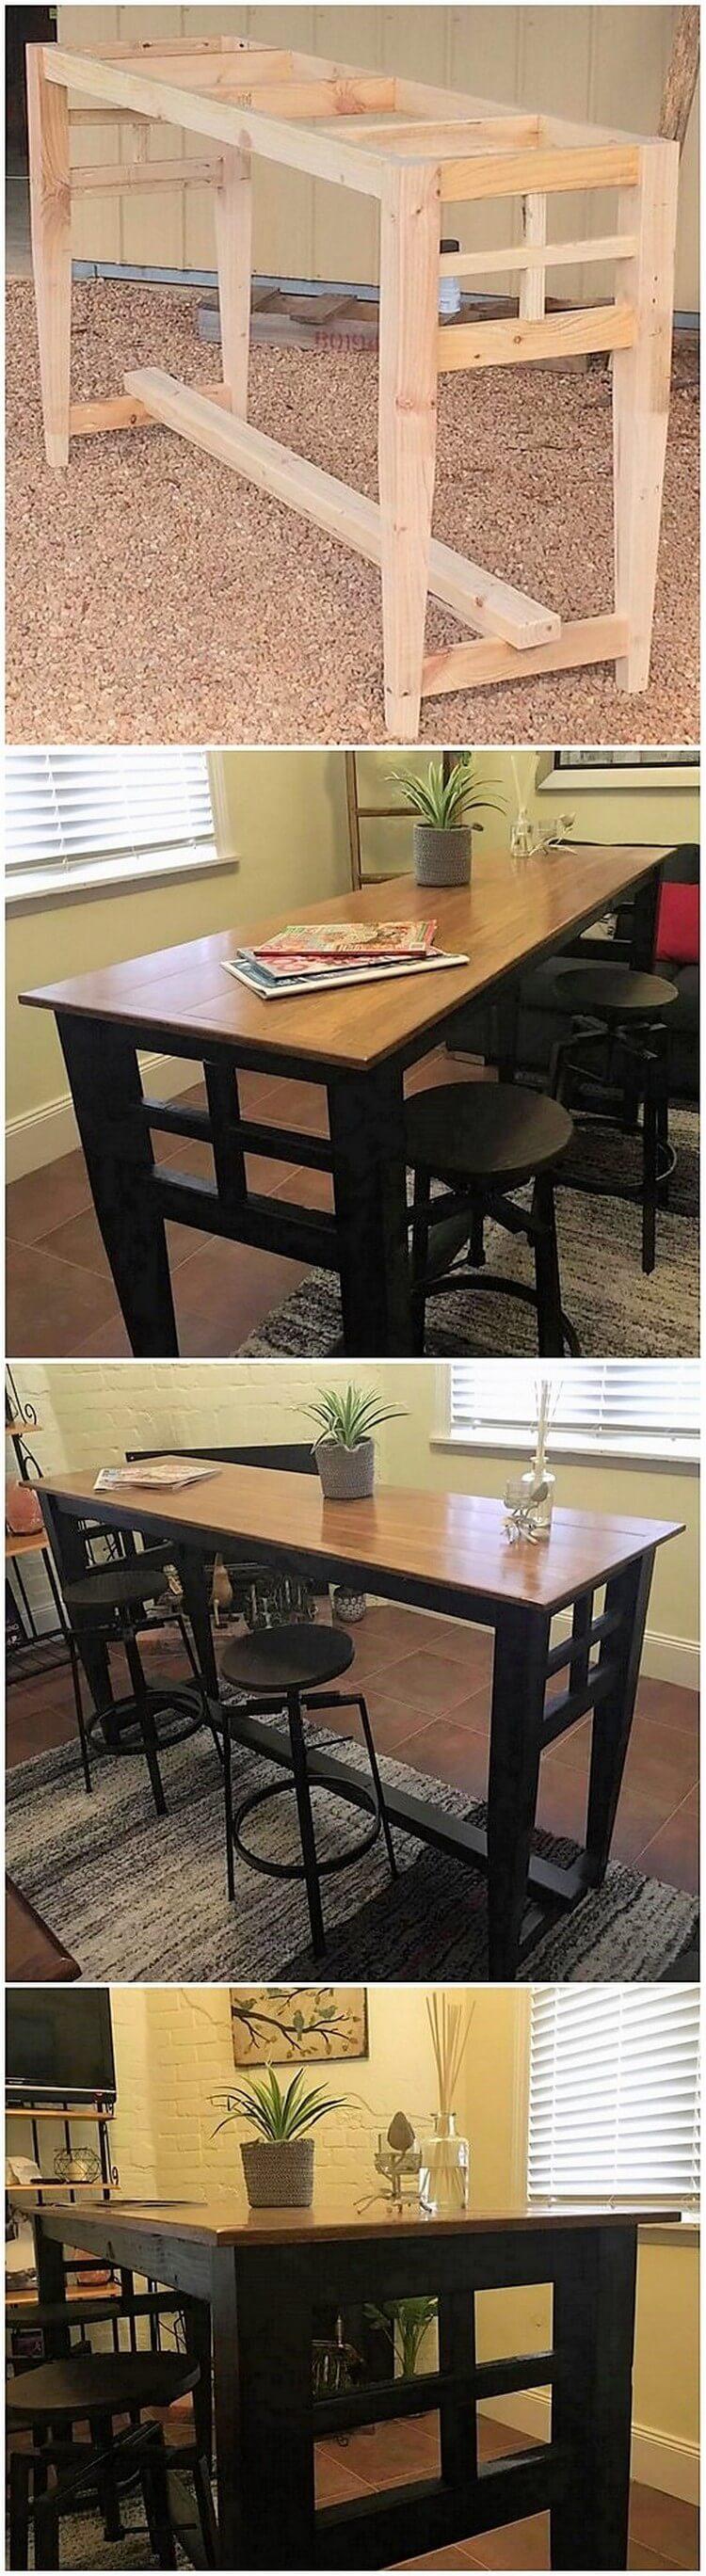 DIY Palle Table